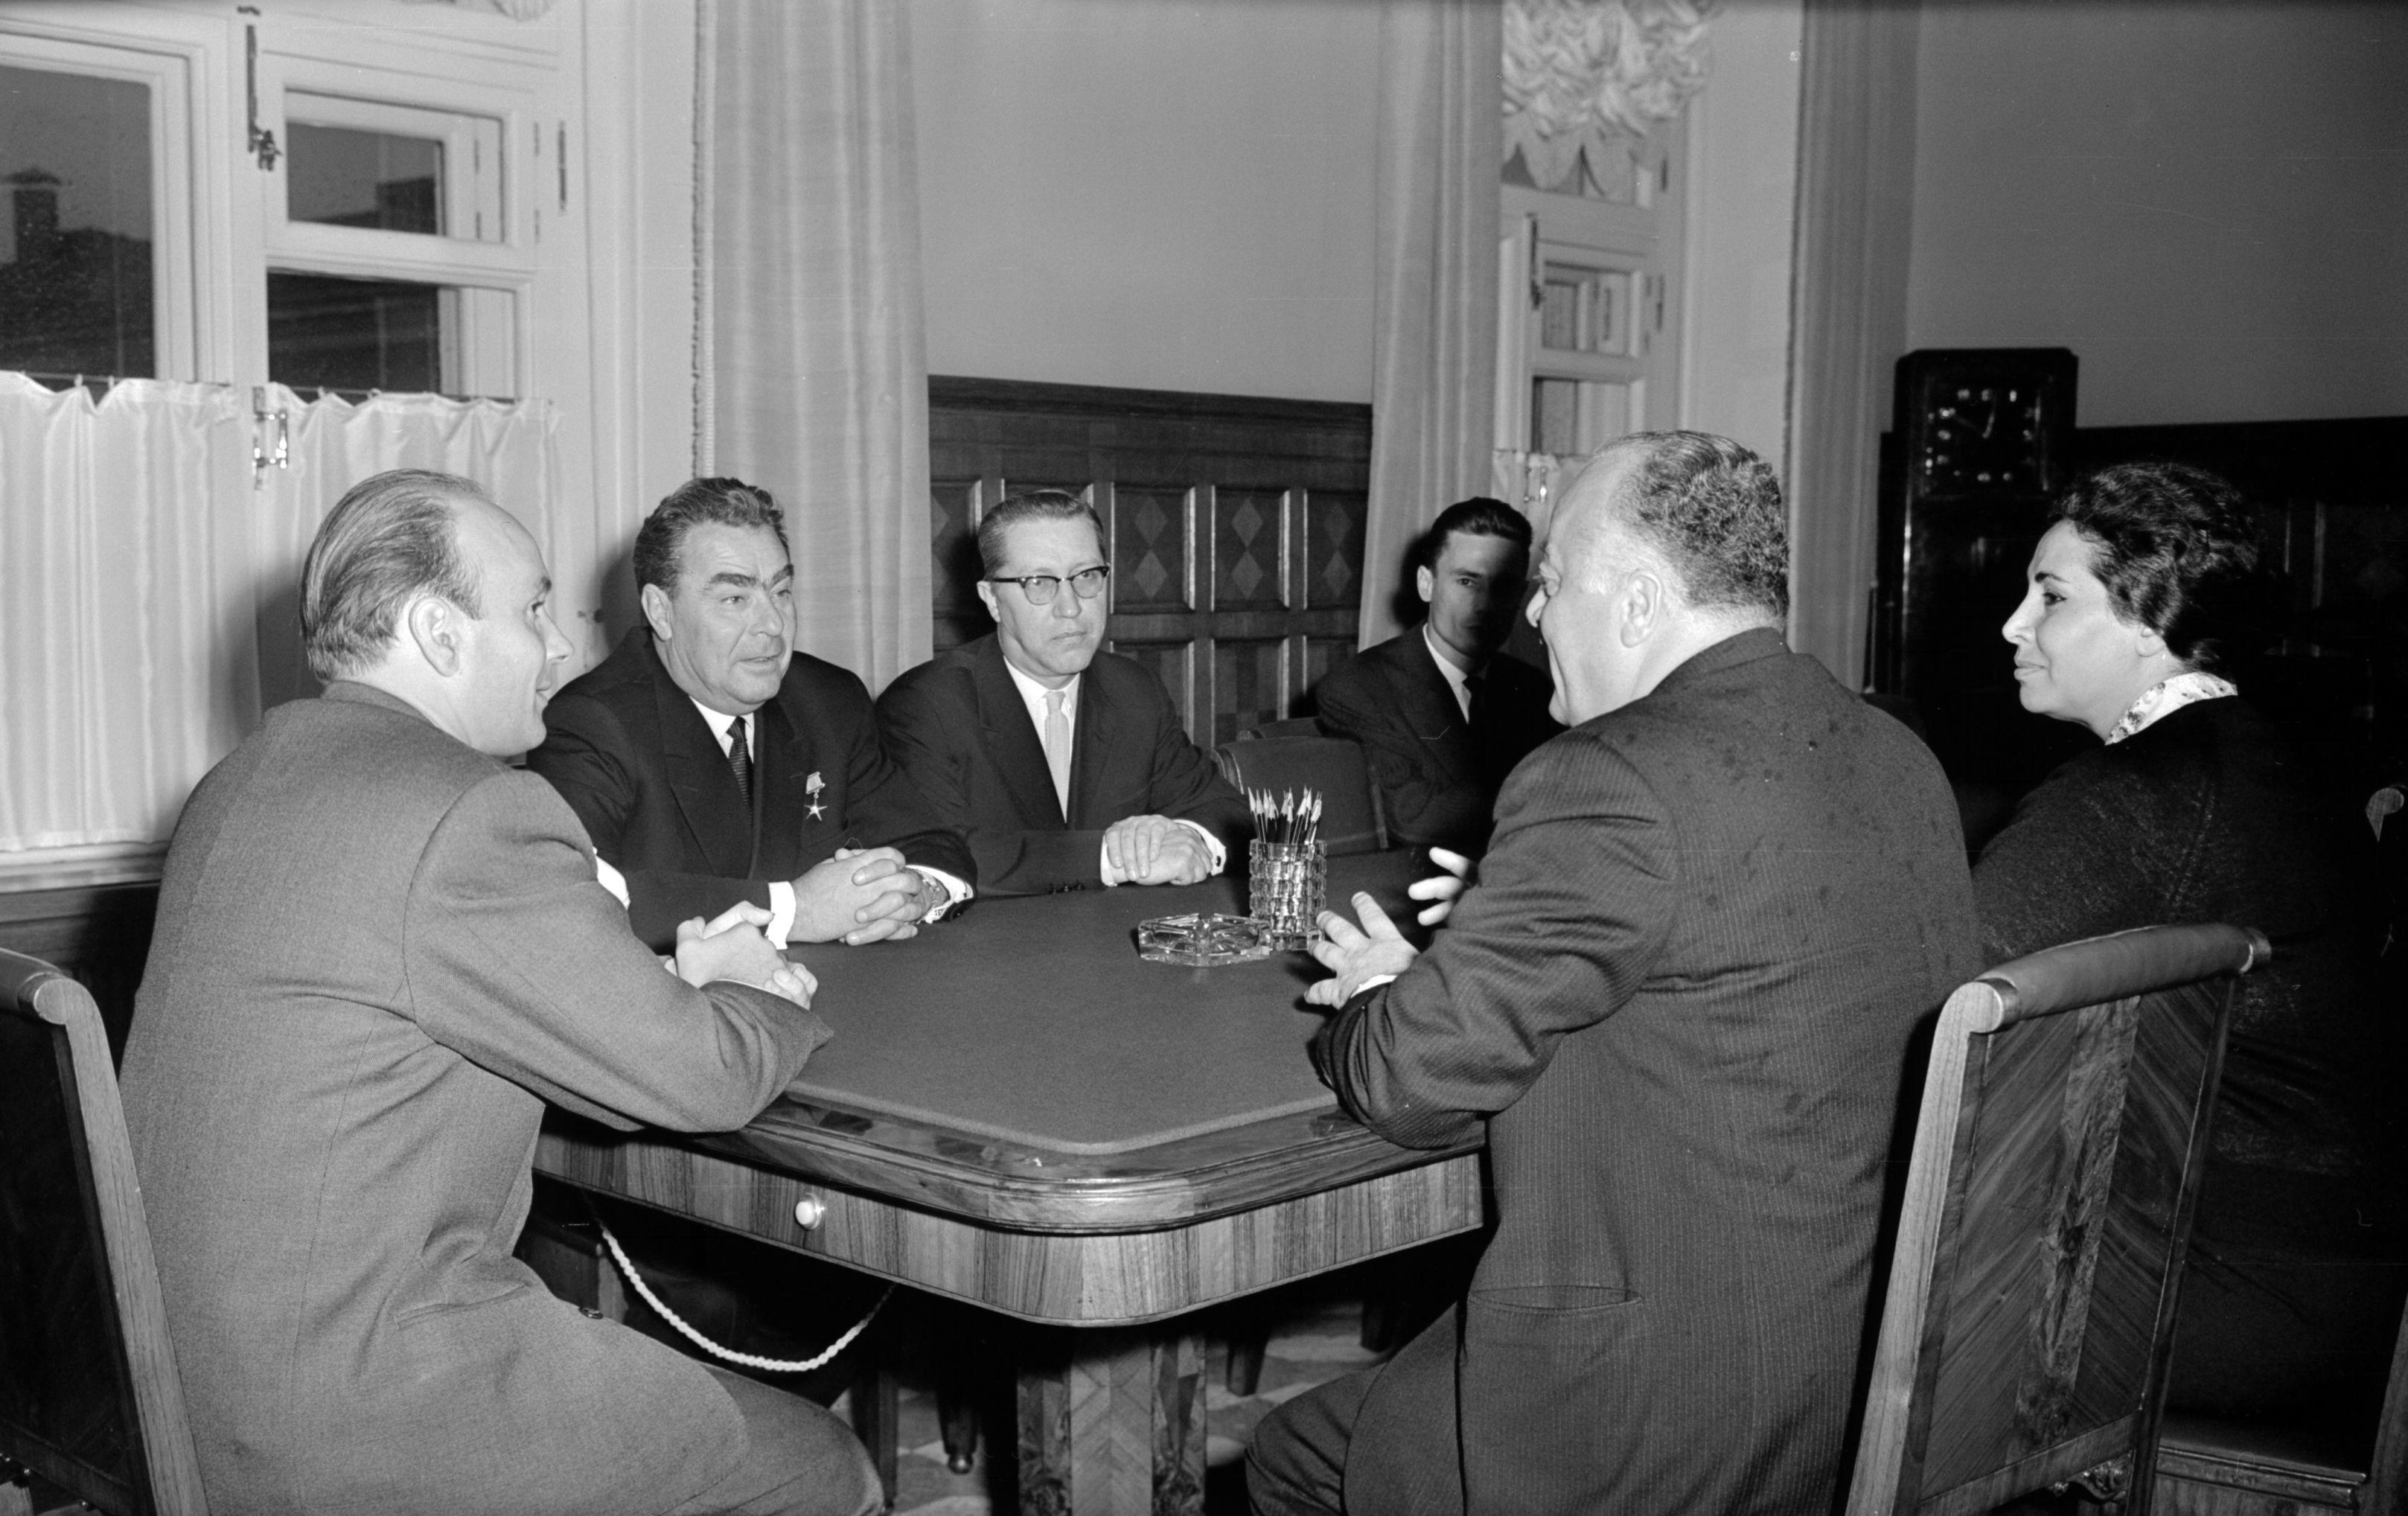 Moscow stay of a representative of the Kingdom of Saudi Arabia. Reception of the representative of Saudi Arabia Ahmad Shukeiri by L.I. Brezhnev, 1962